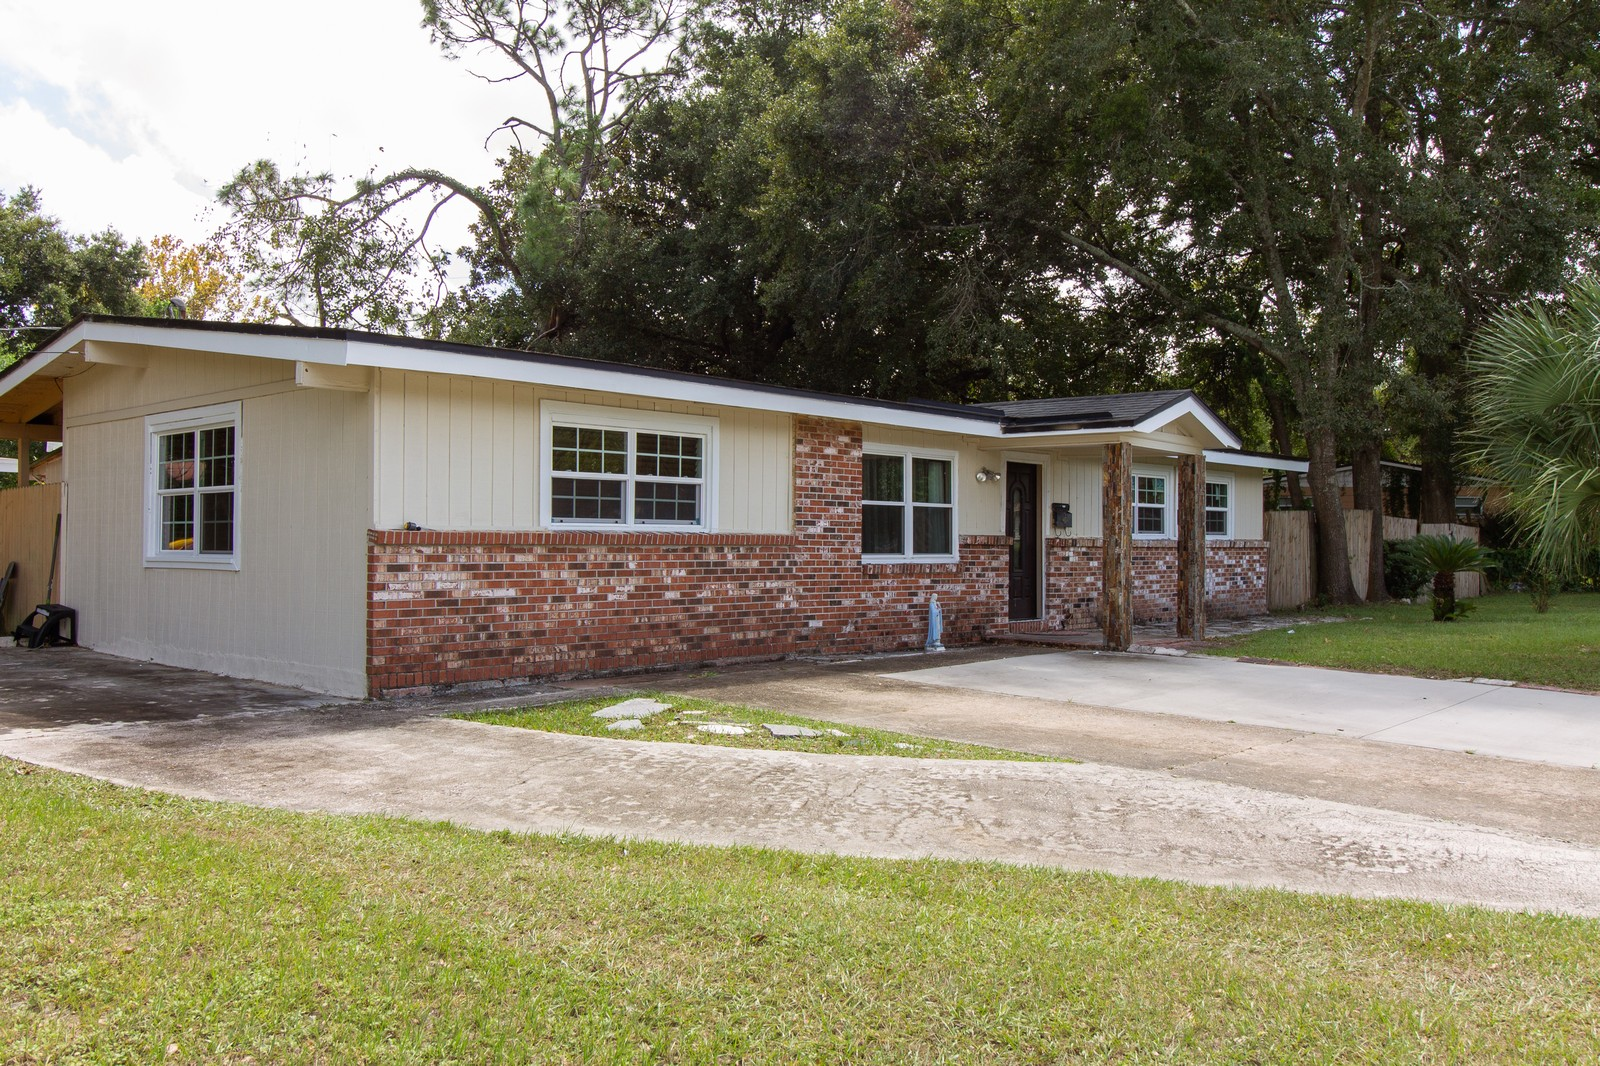 Real Estate Photography - 2519 COTILLION RD, JACKSONVILLE, FL, 32211 - Driveway